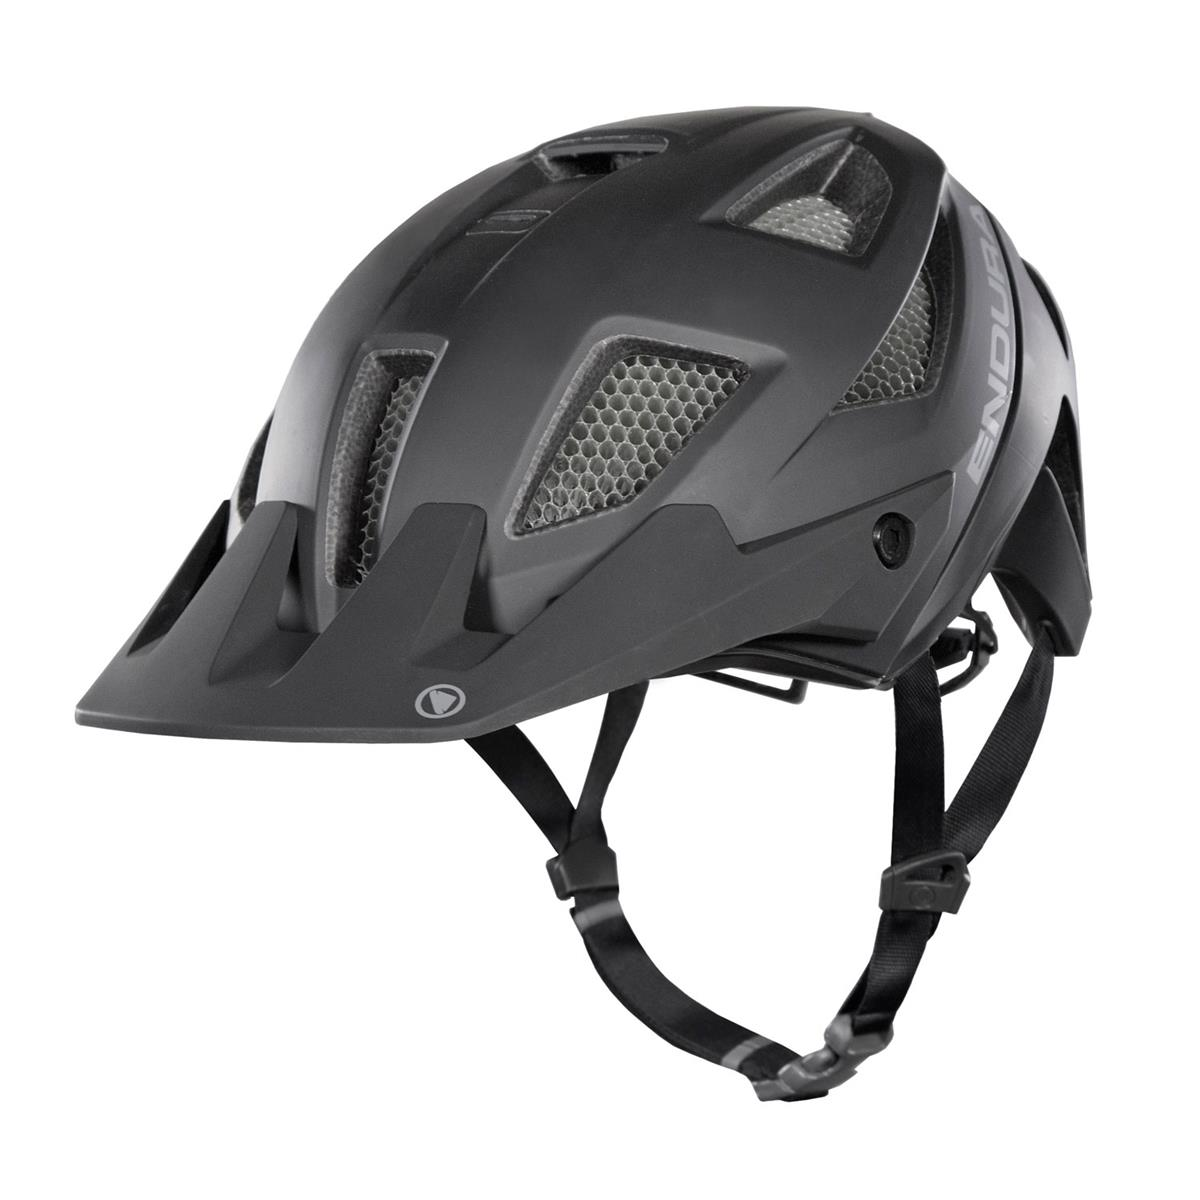 MT500 helmet black size S/M (51-56cm)